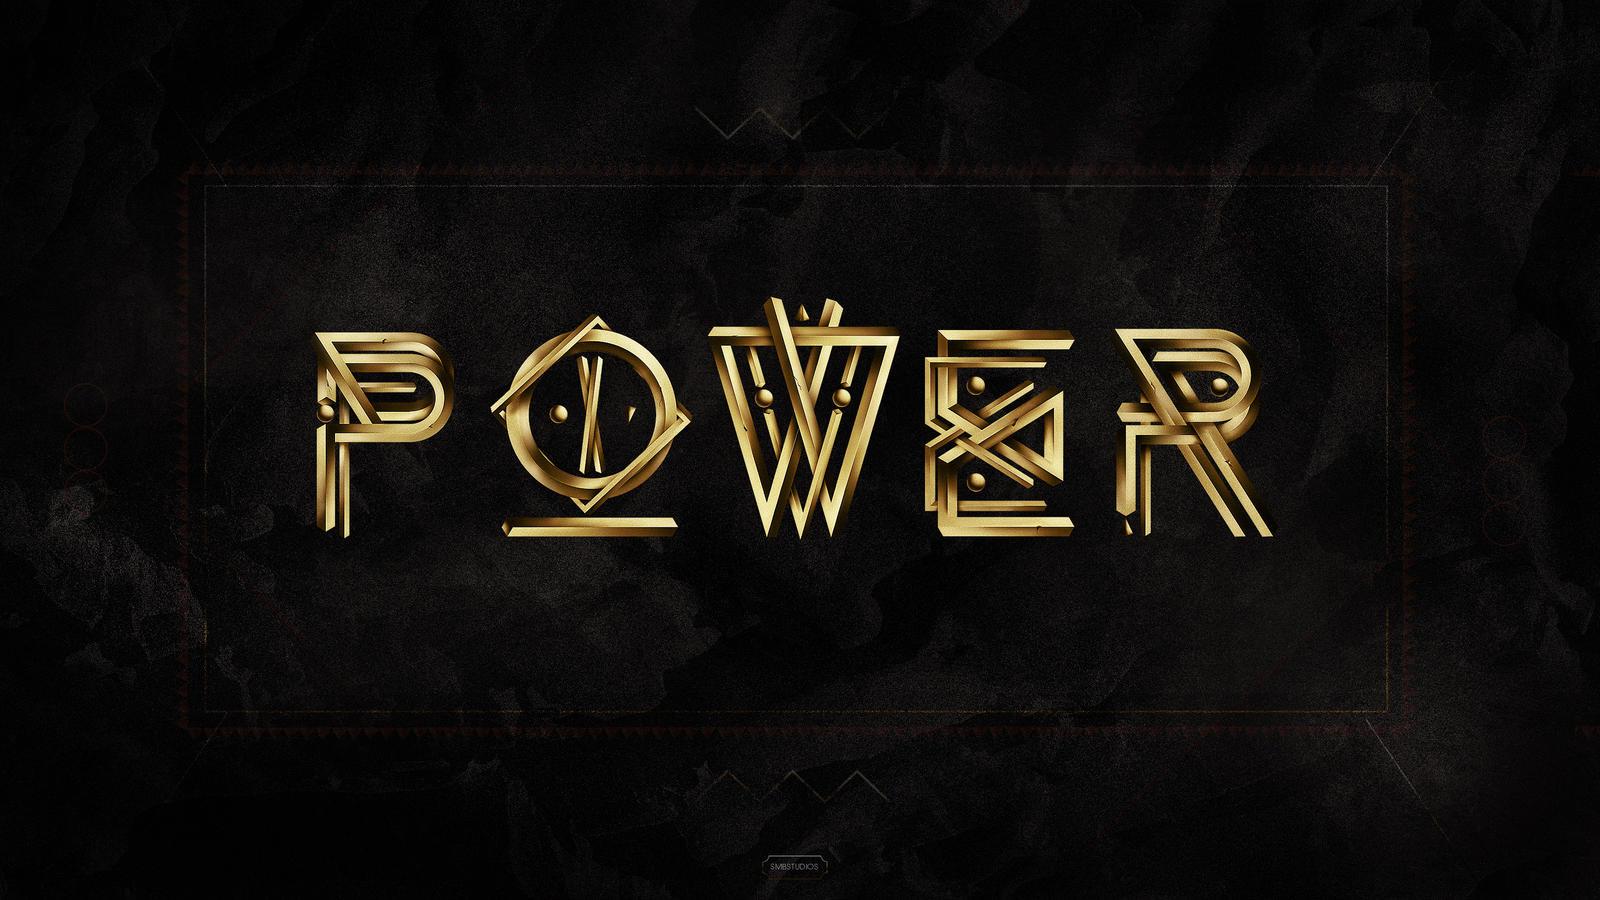 POWER 2011 Wallpaper by crymz on DeviantArt